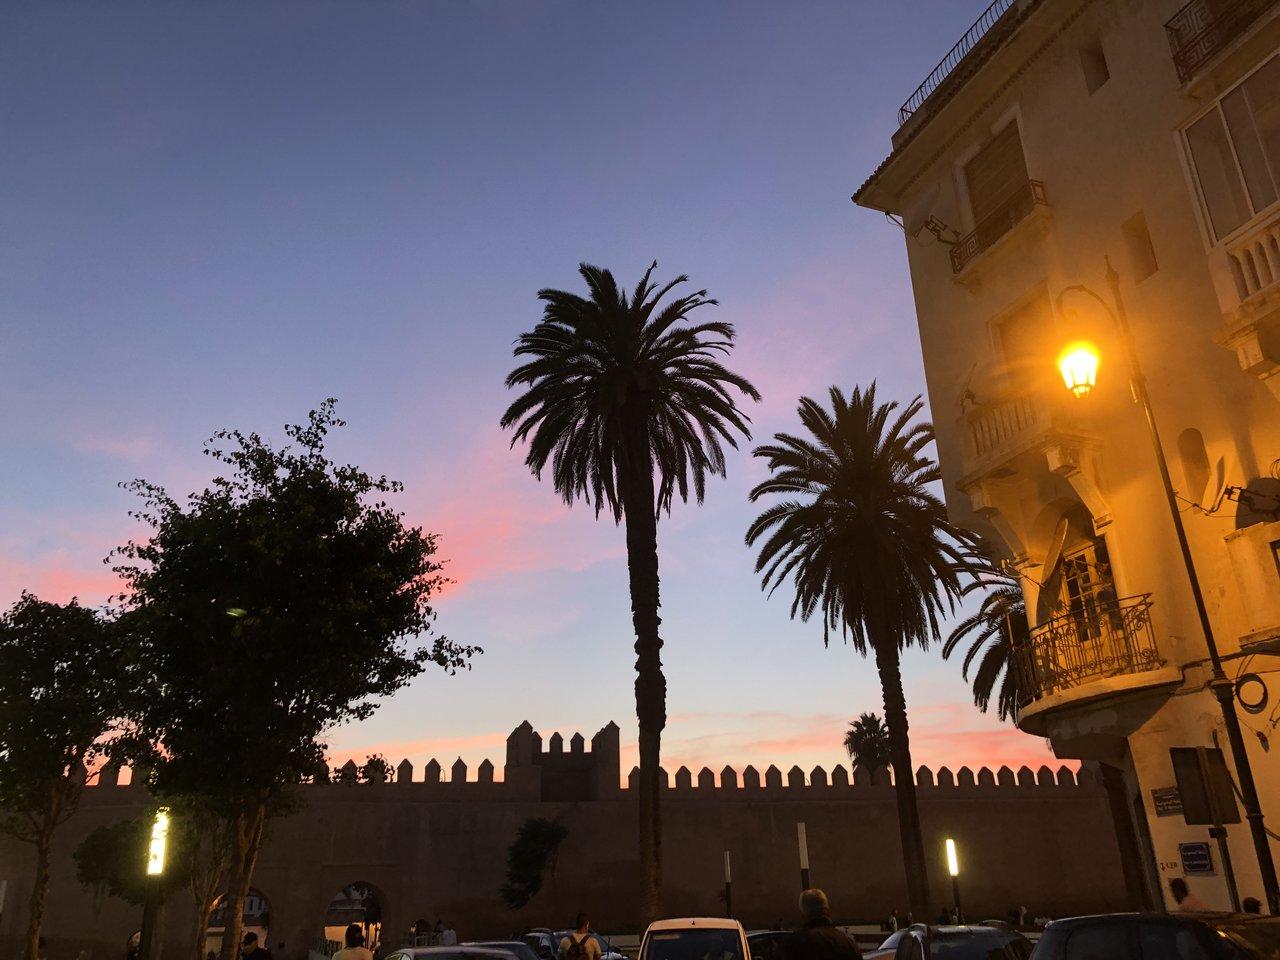 Evening in Rabat | Photo taken by Jennifer K